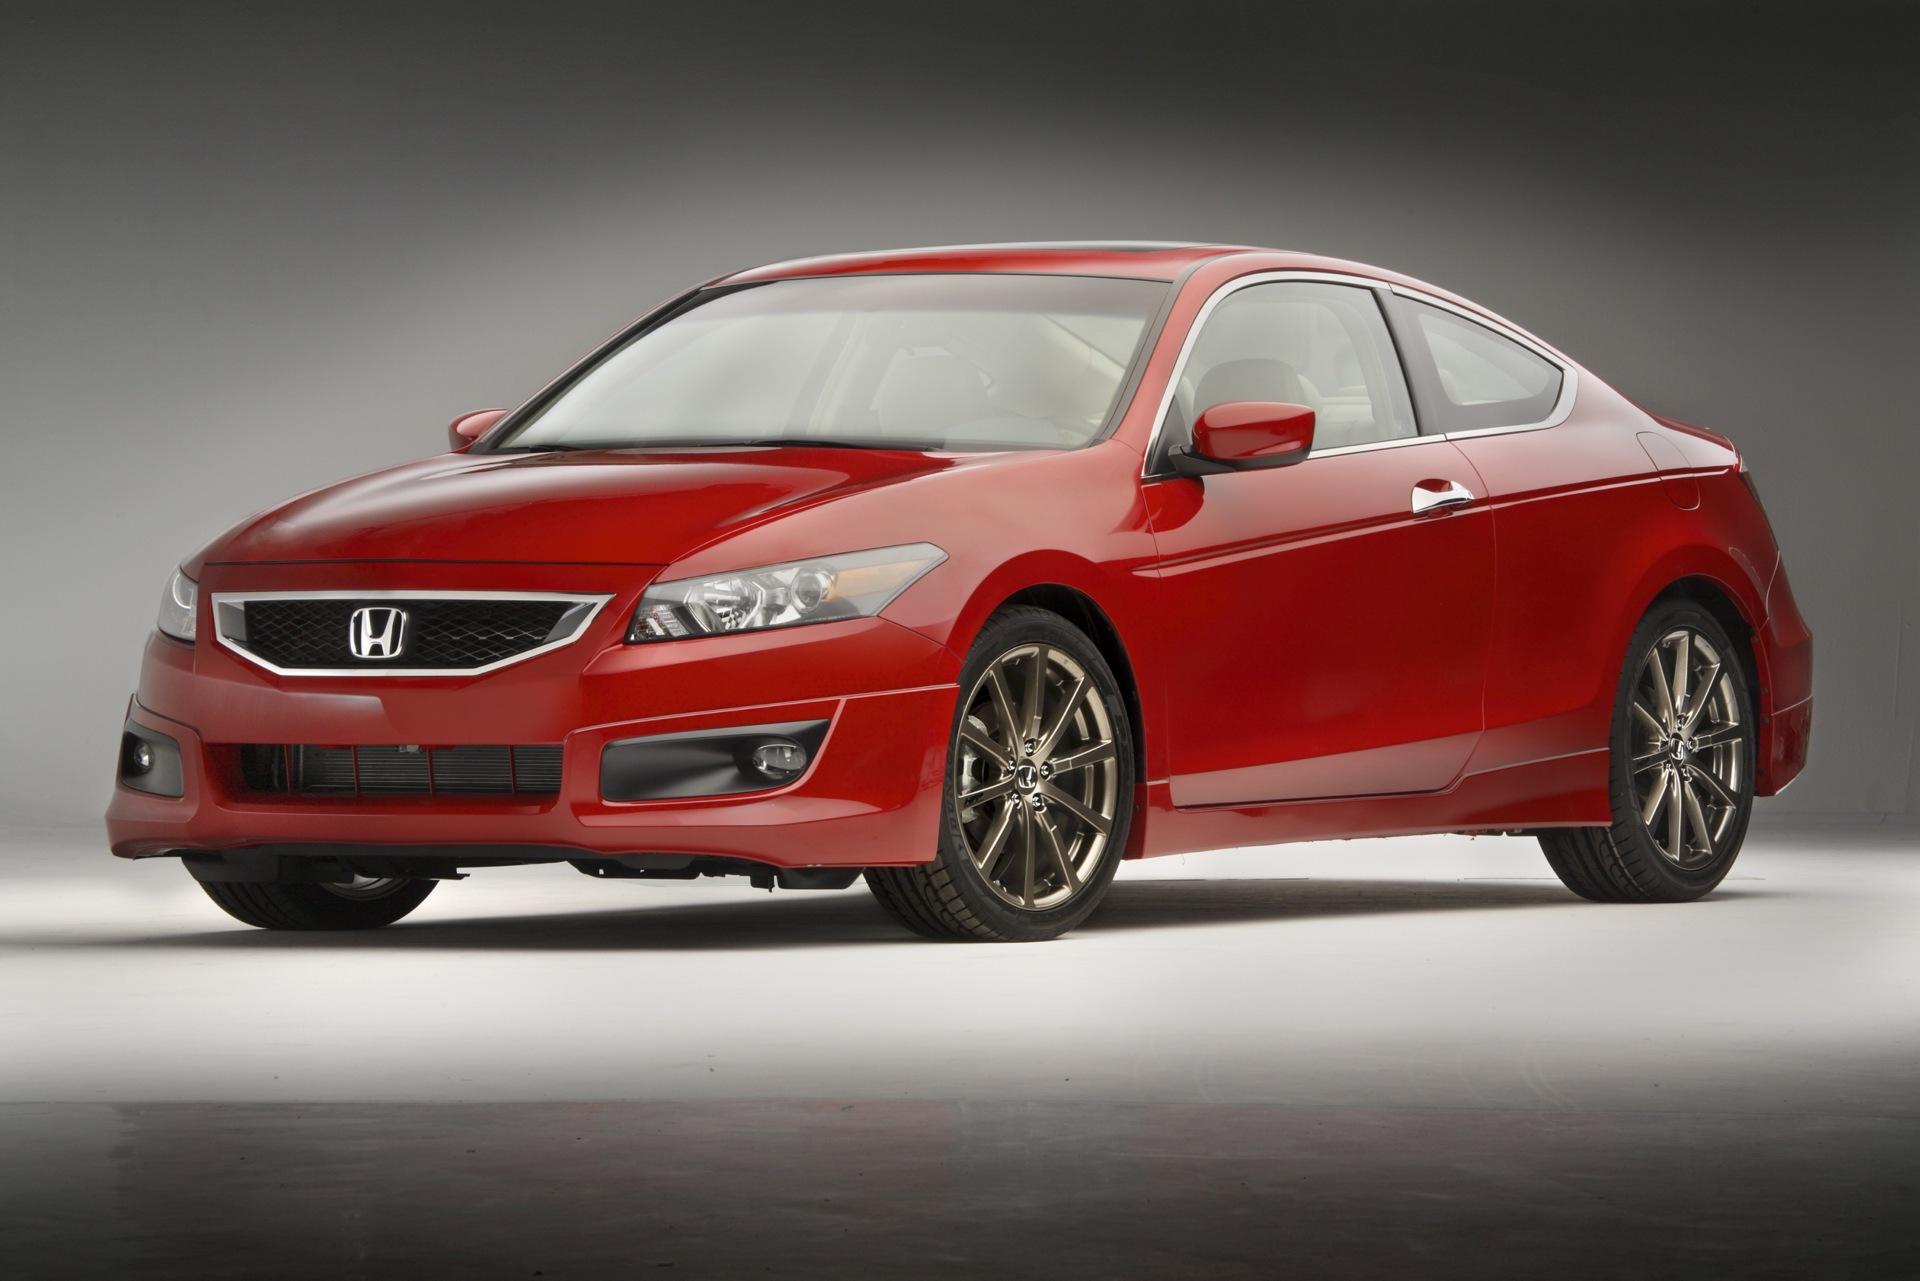 2010 Honda Accord Concept photo - 1